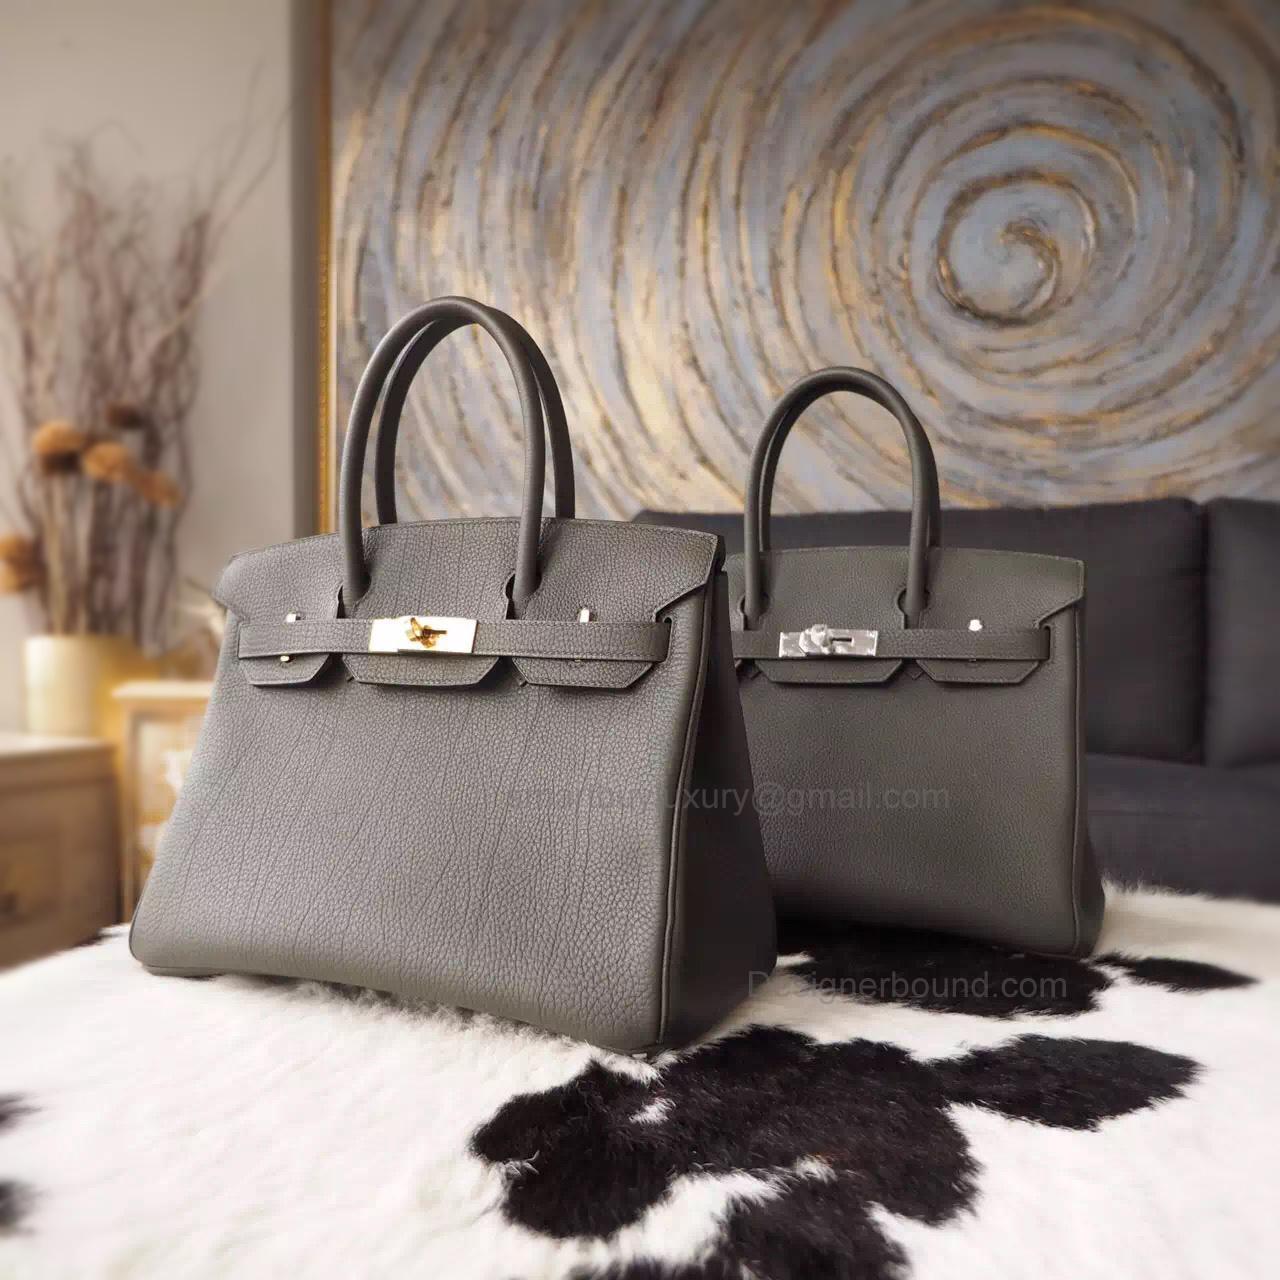 Hand Stitched Hermes Birkin 35 Bag in 6c Vert Gris Togo Calfskin - 7f2c790936d1e